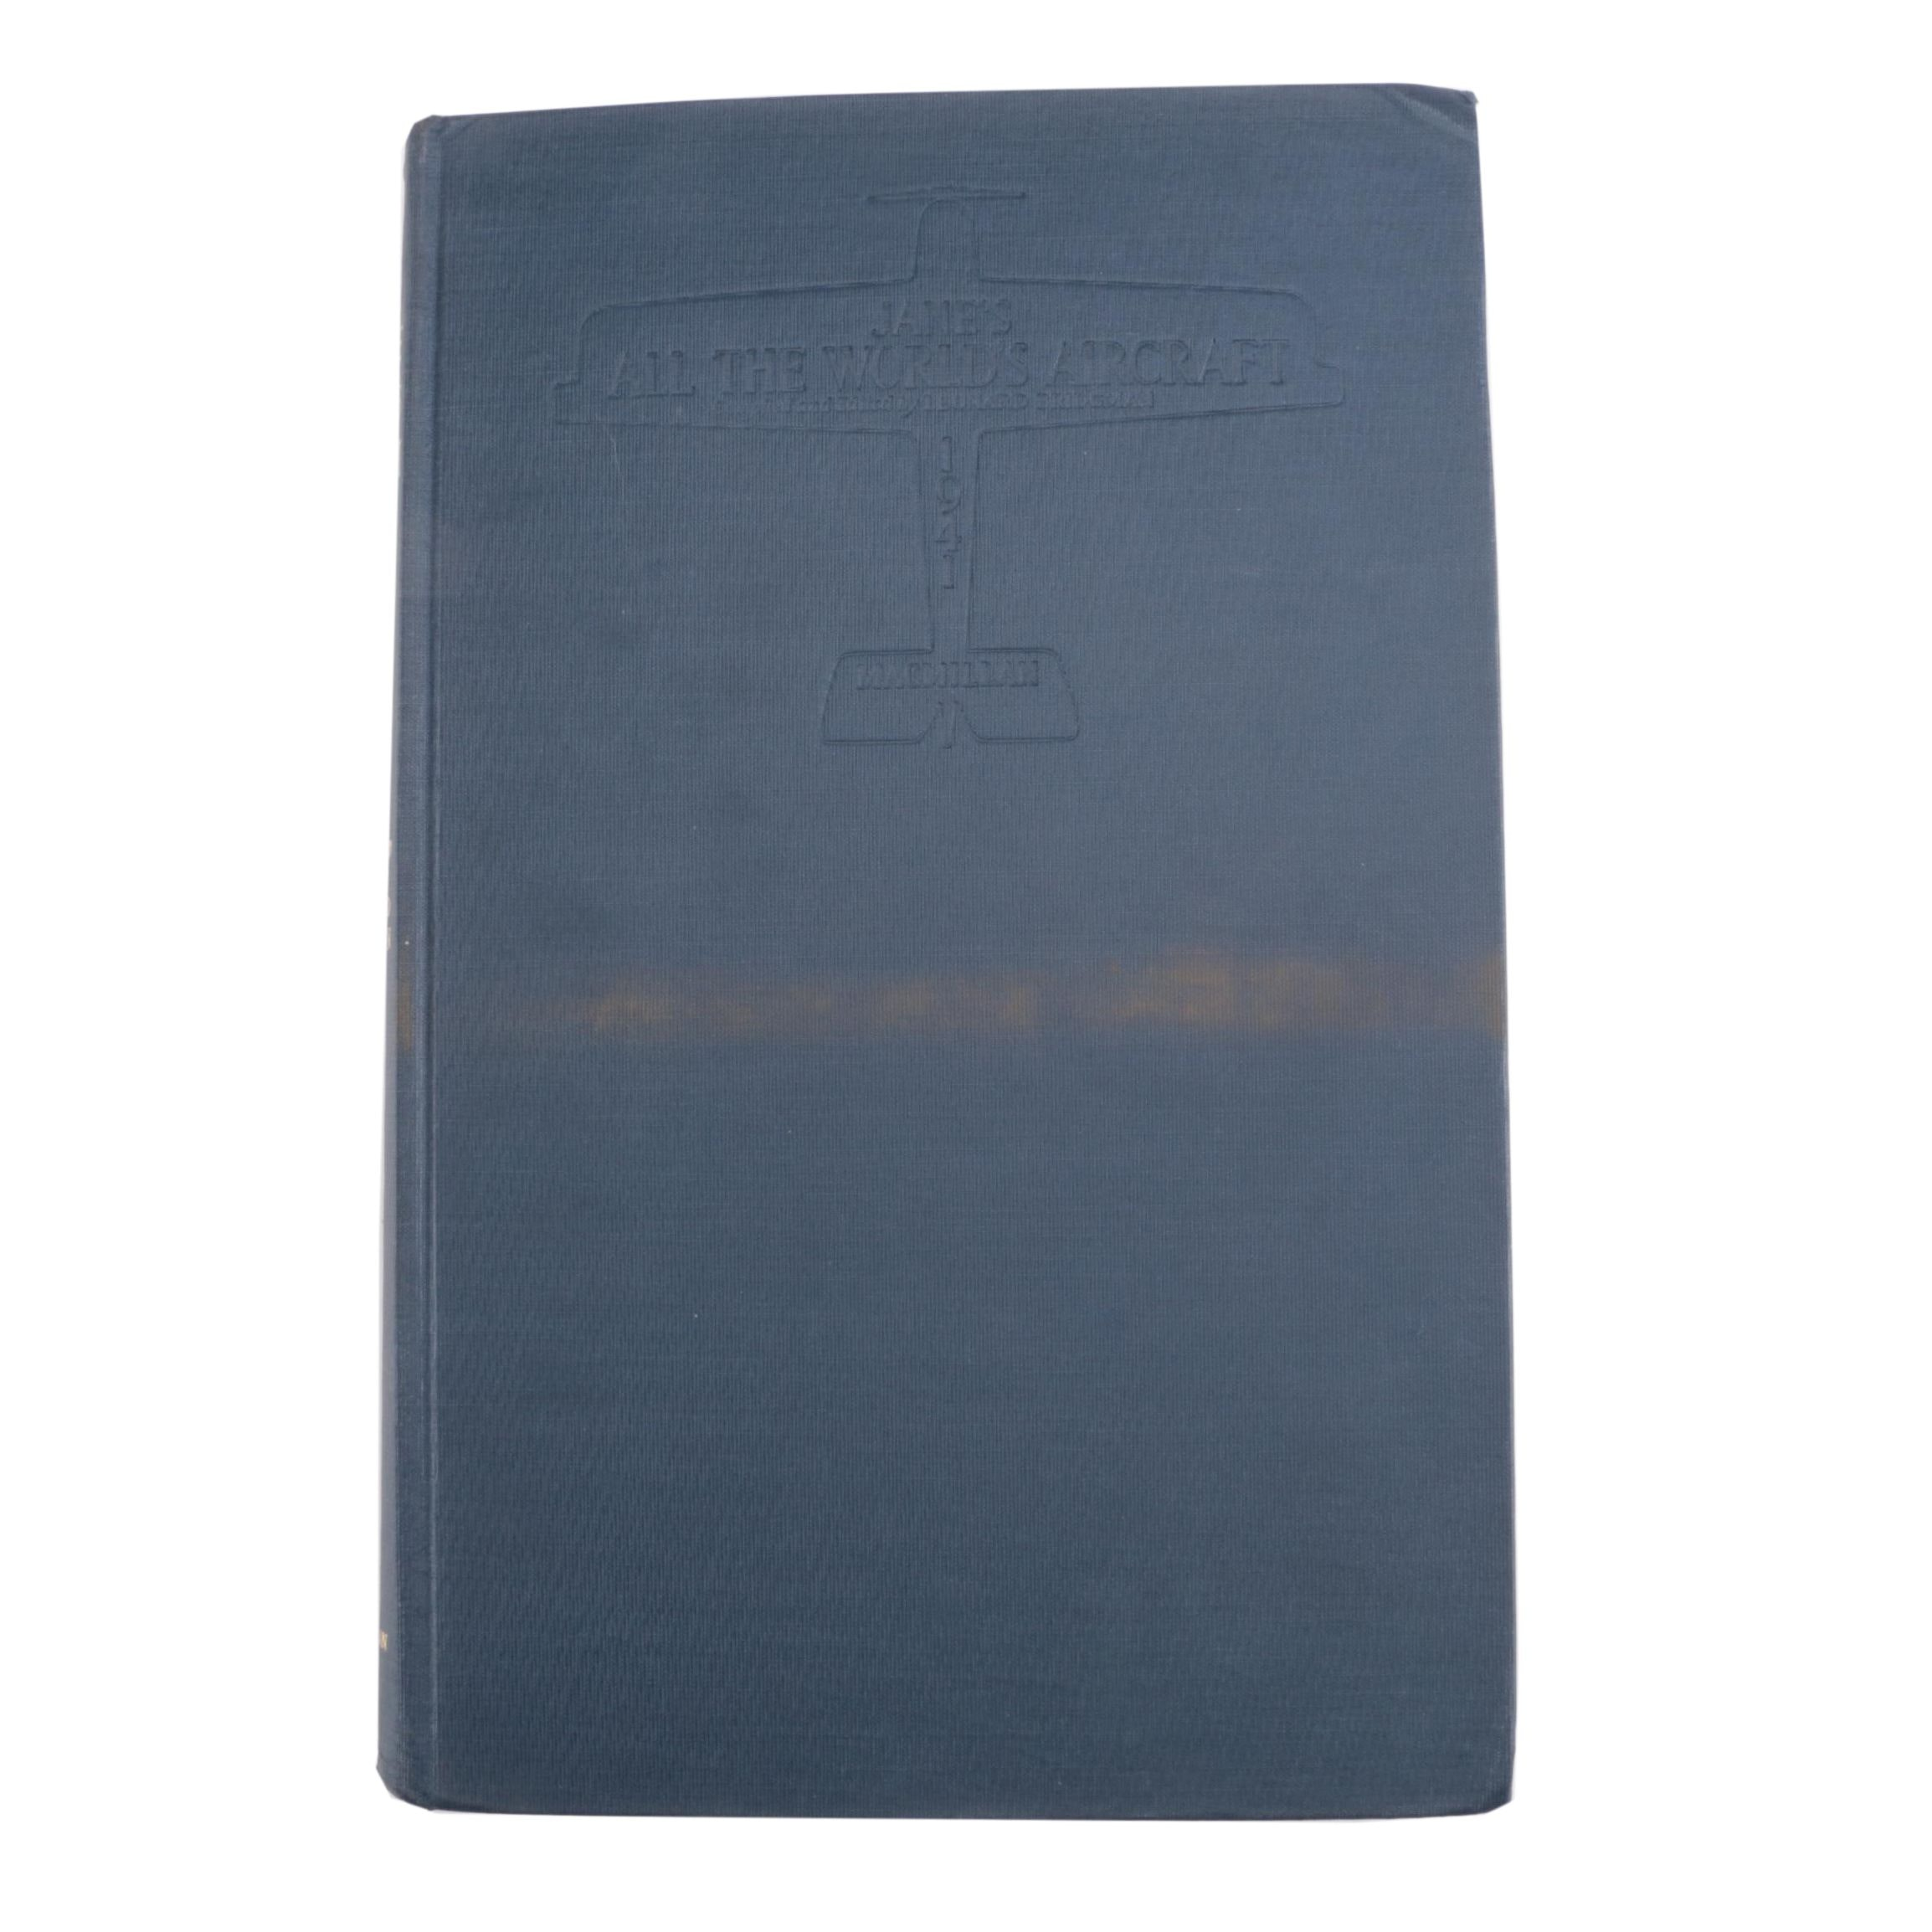 """Jane's All the World's Aircraft 1941"" Edited by Leonard Bridgman"